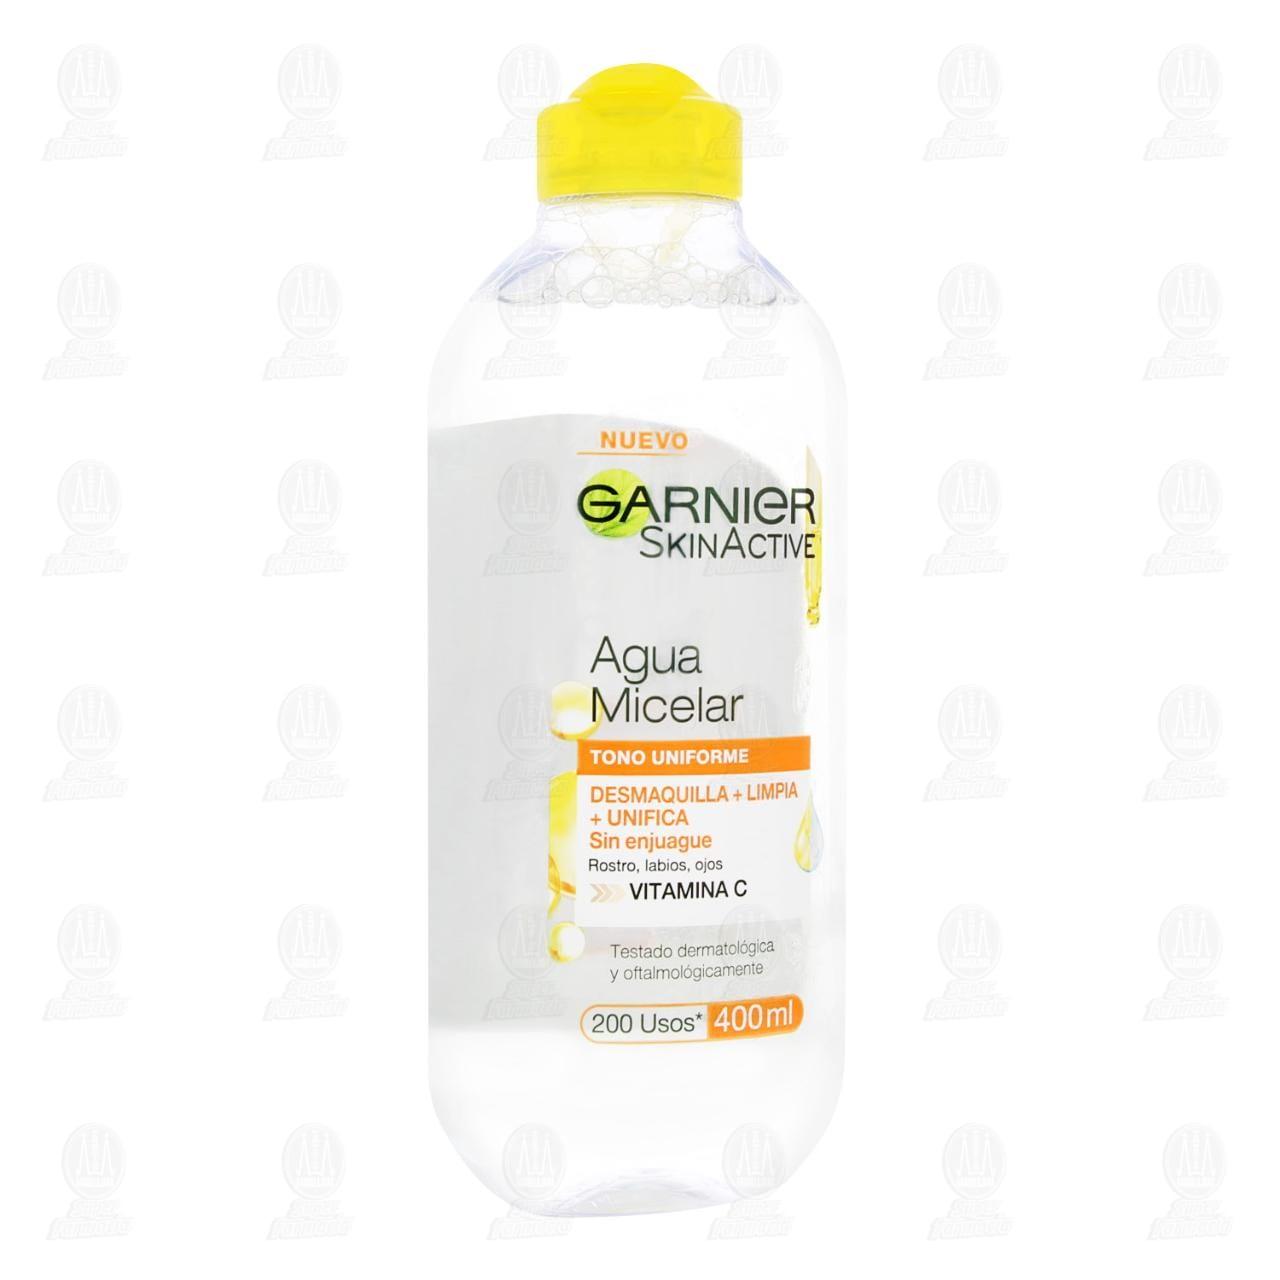 Comprar Agua Micelar Garnier SkinActive Express Aclara Tono Uniforme, 400 ml. en Farmacias Guadalajara